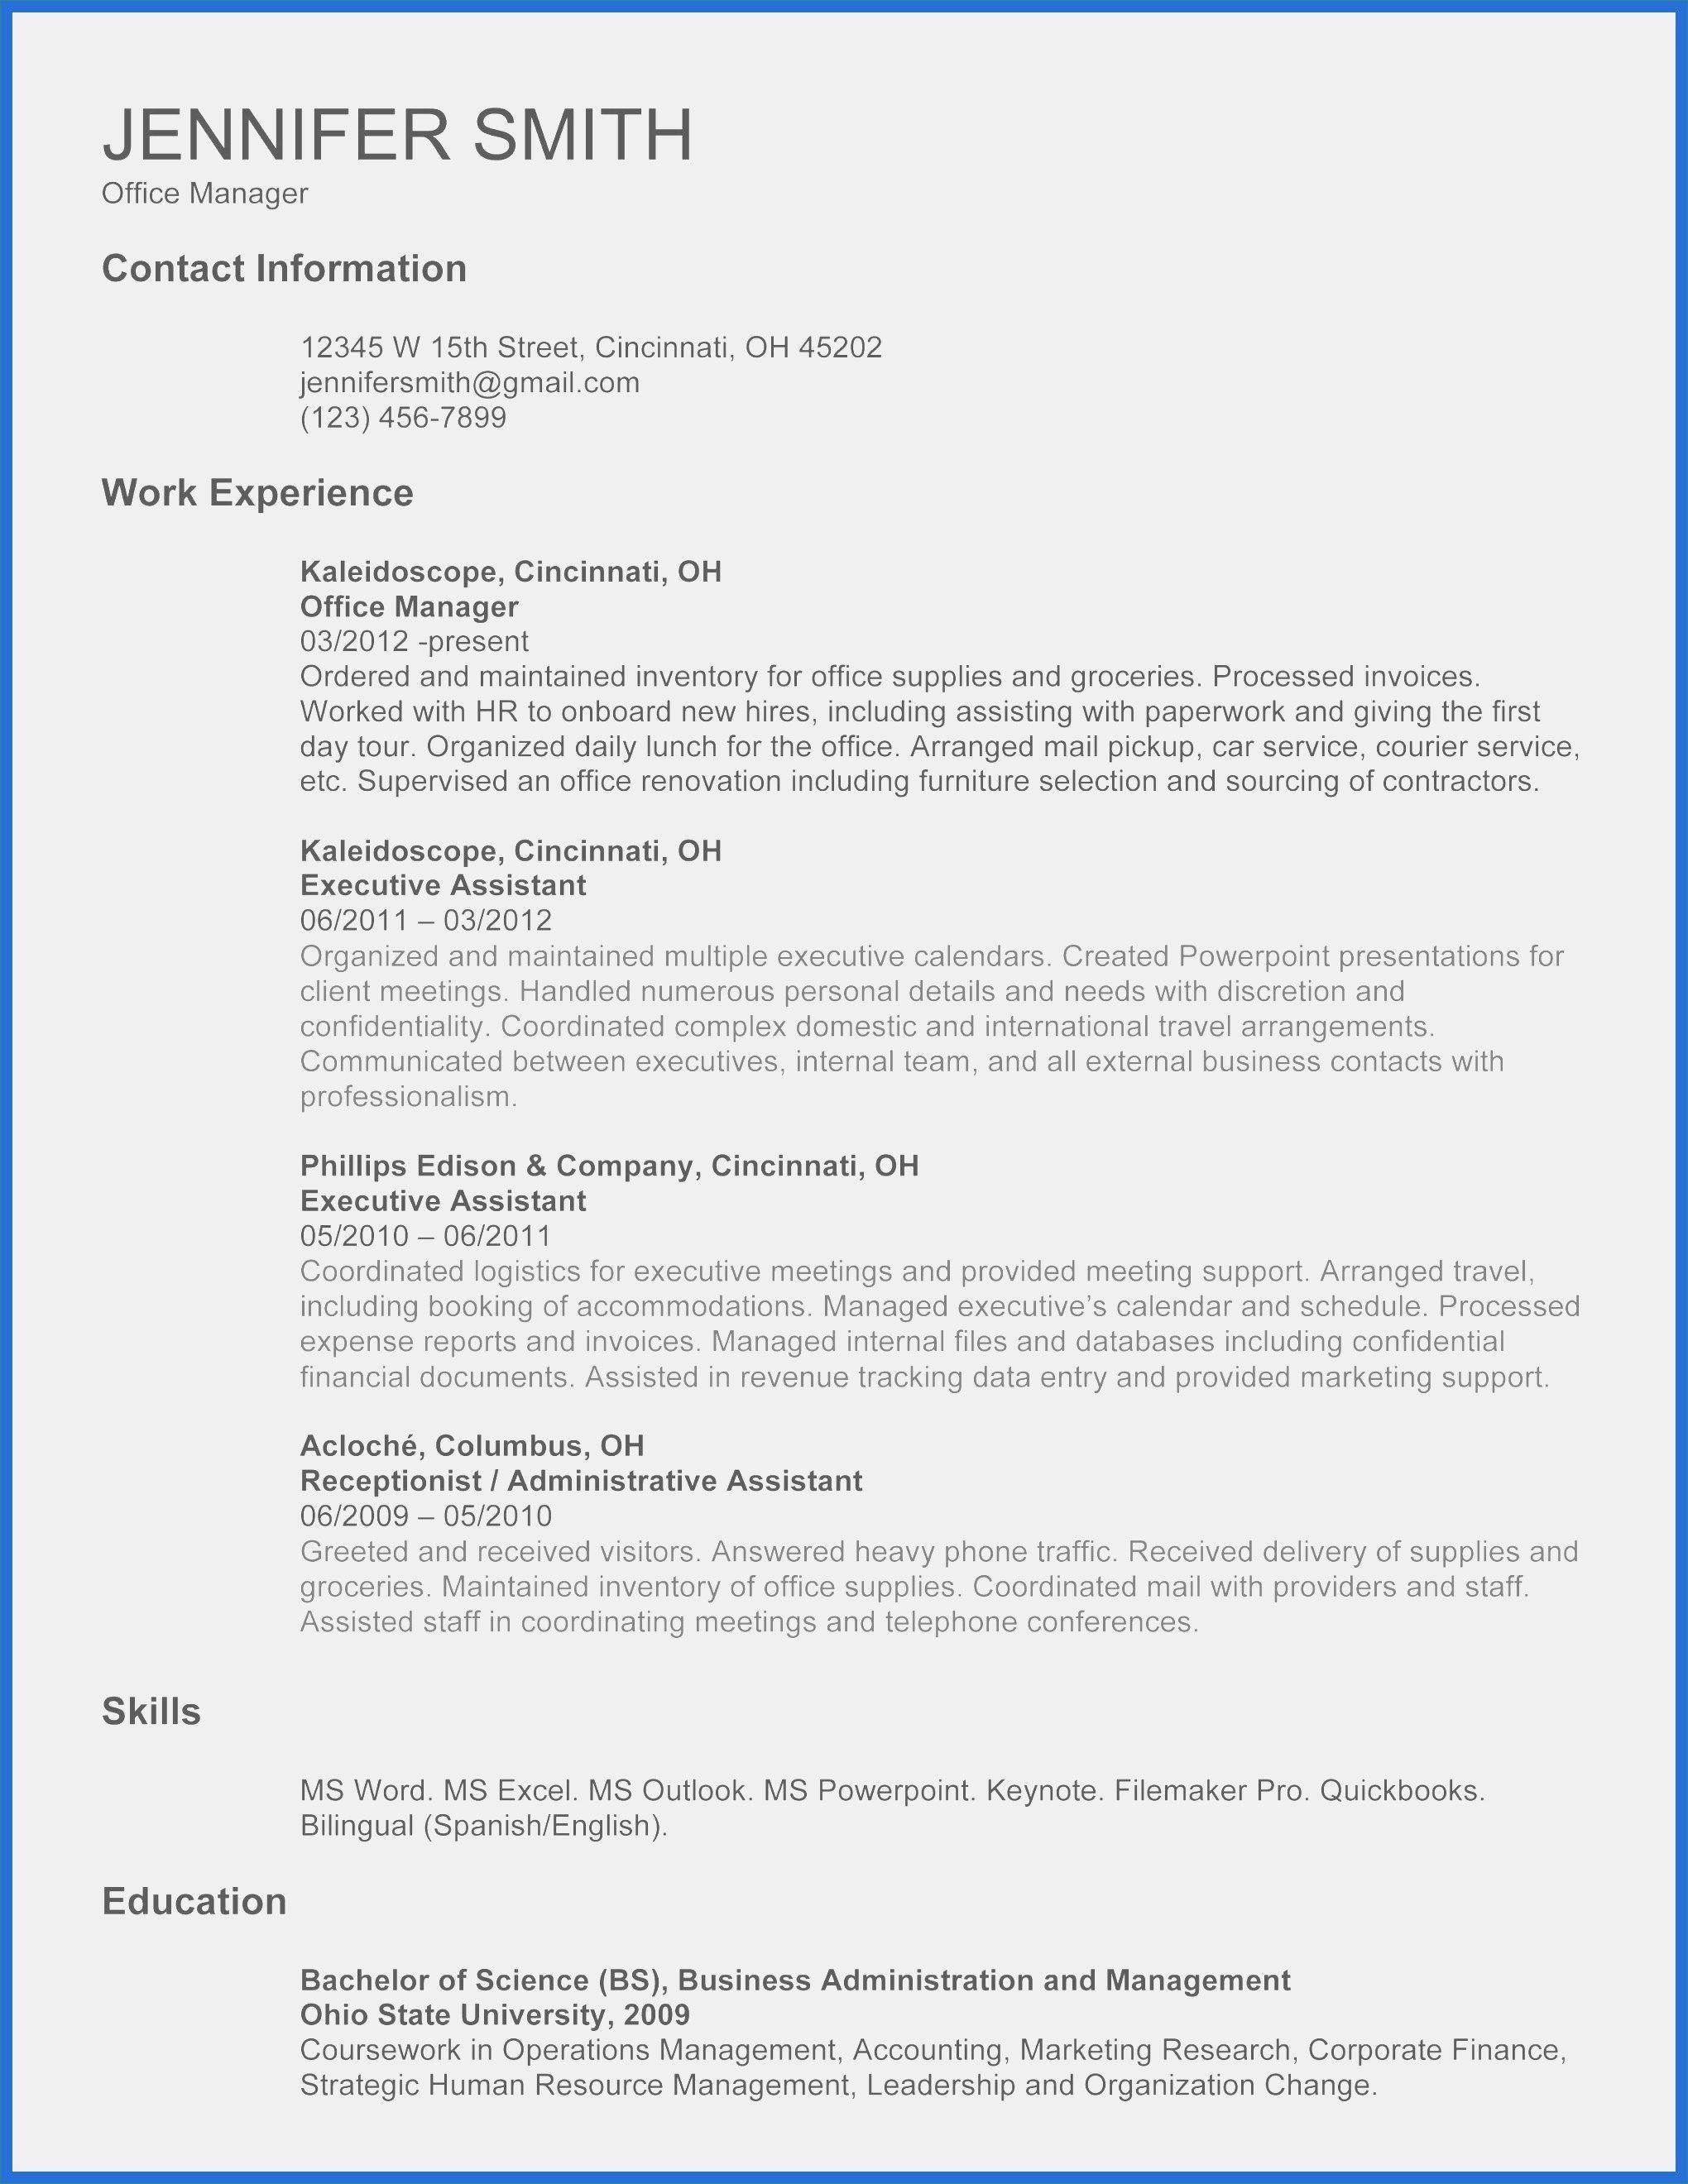 Resume Templates For Interns Professionelle Bewerbung Brief Bewerbung